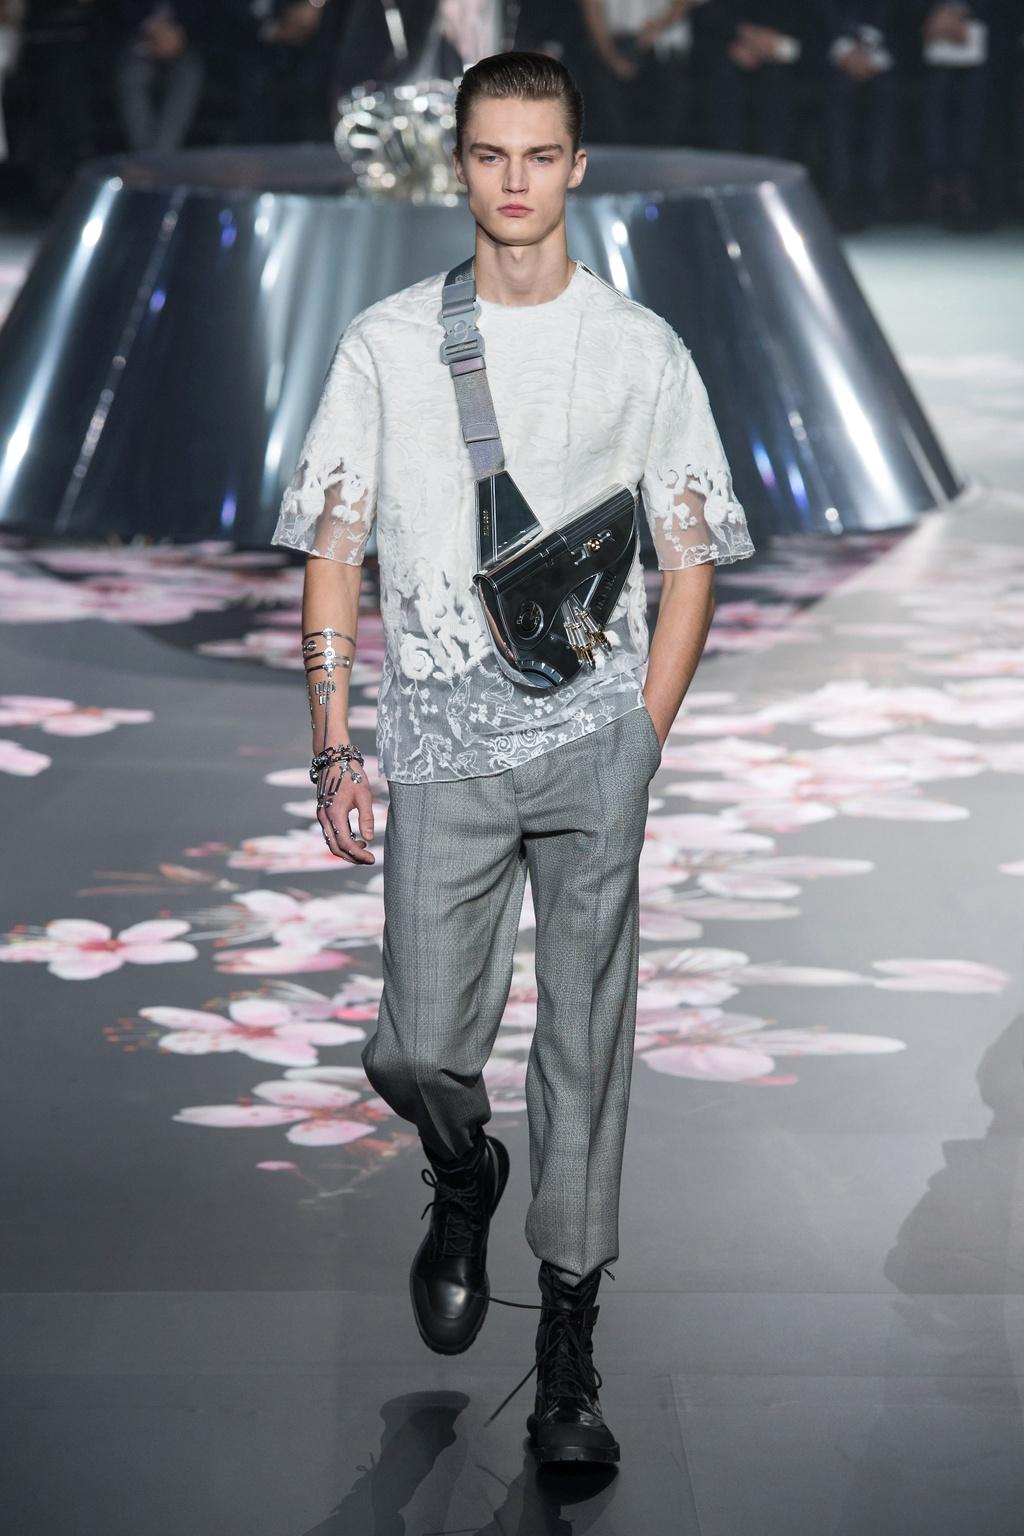 Show dien Dior gay sot voi phu kien giong bao dung sung hinh anh 5